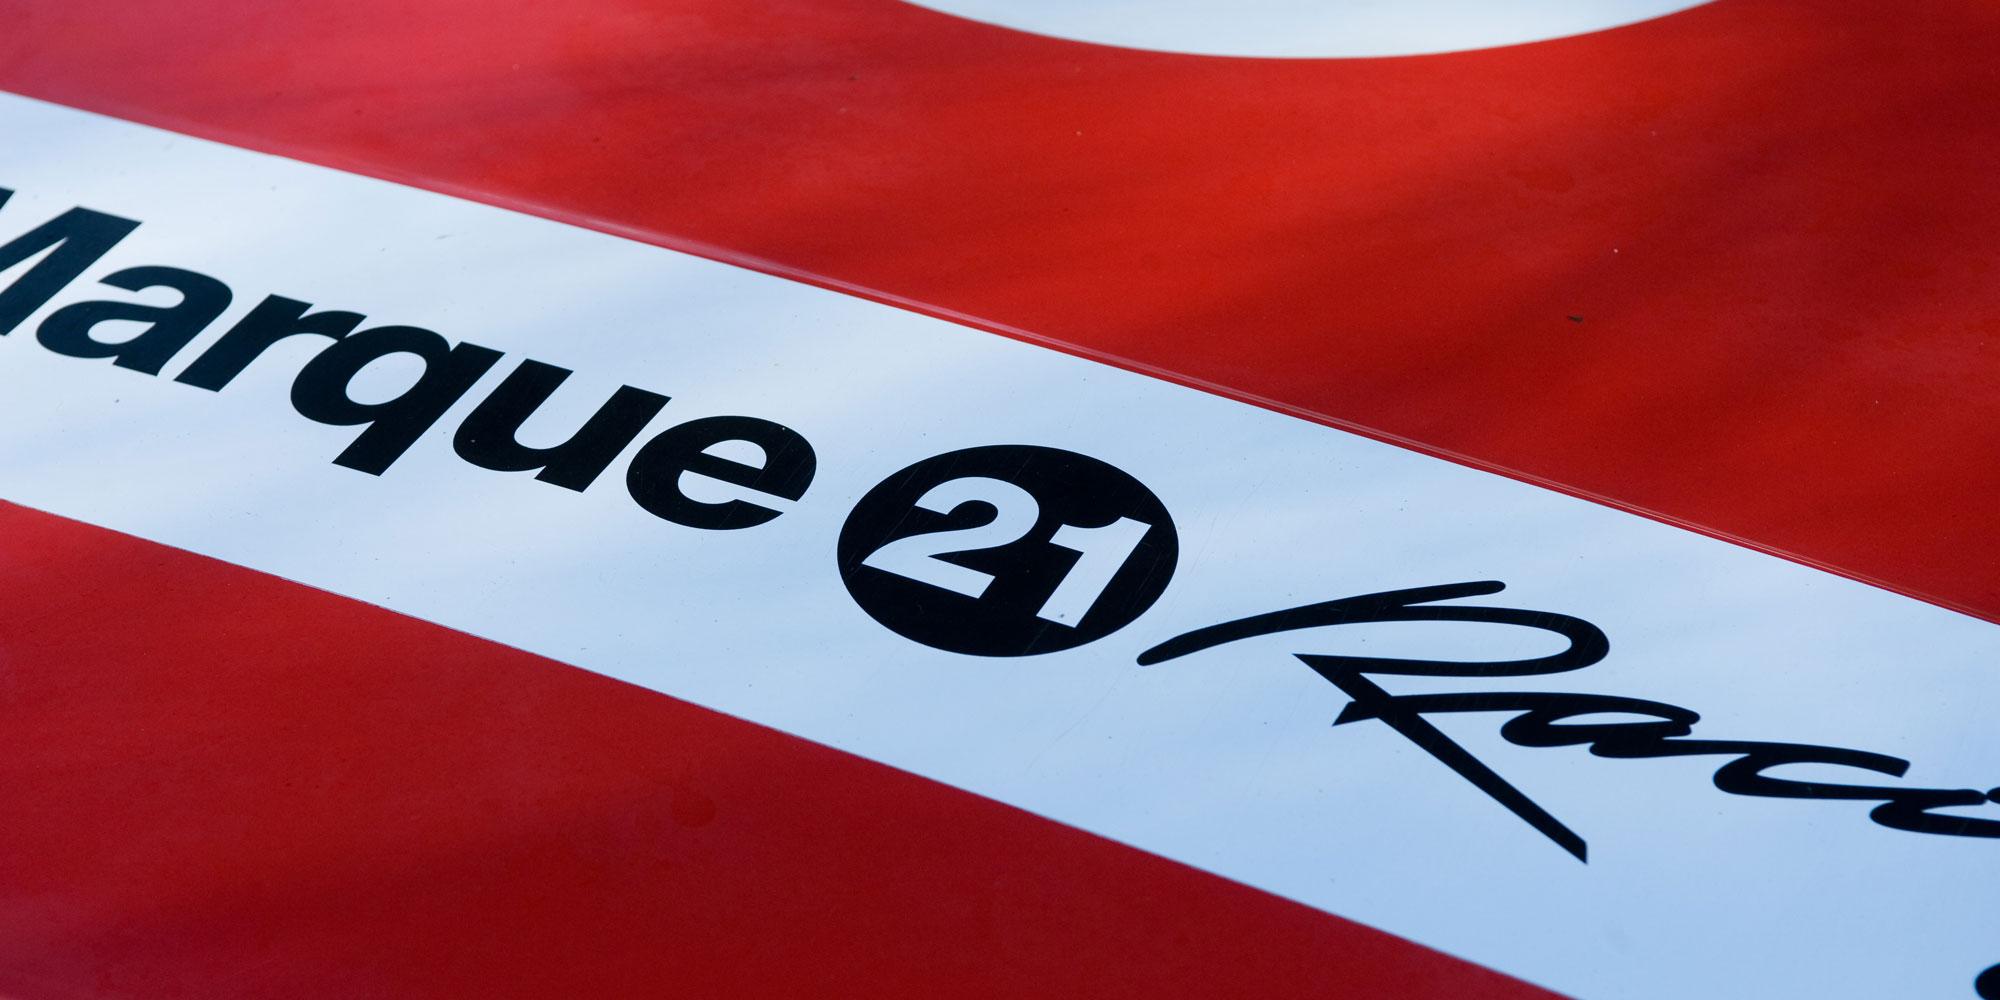 Marque 21 Racing logo